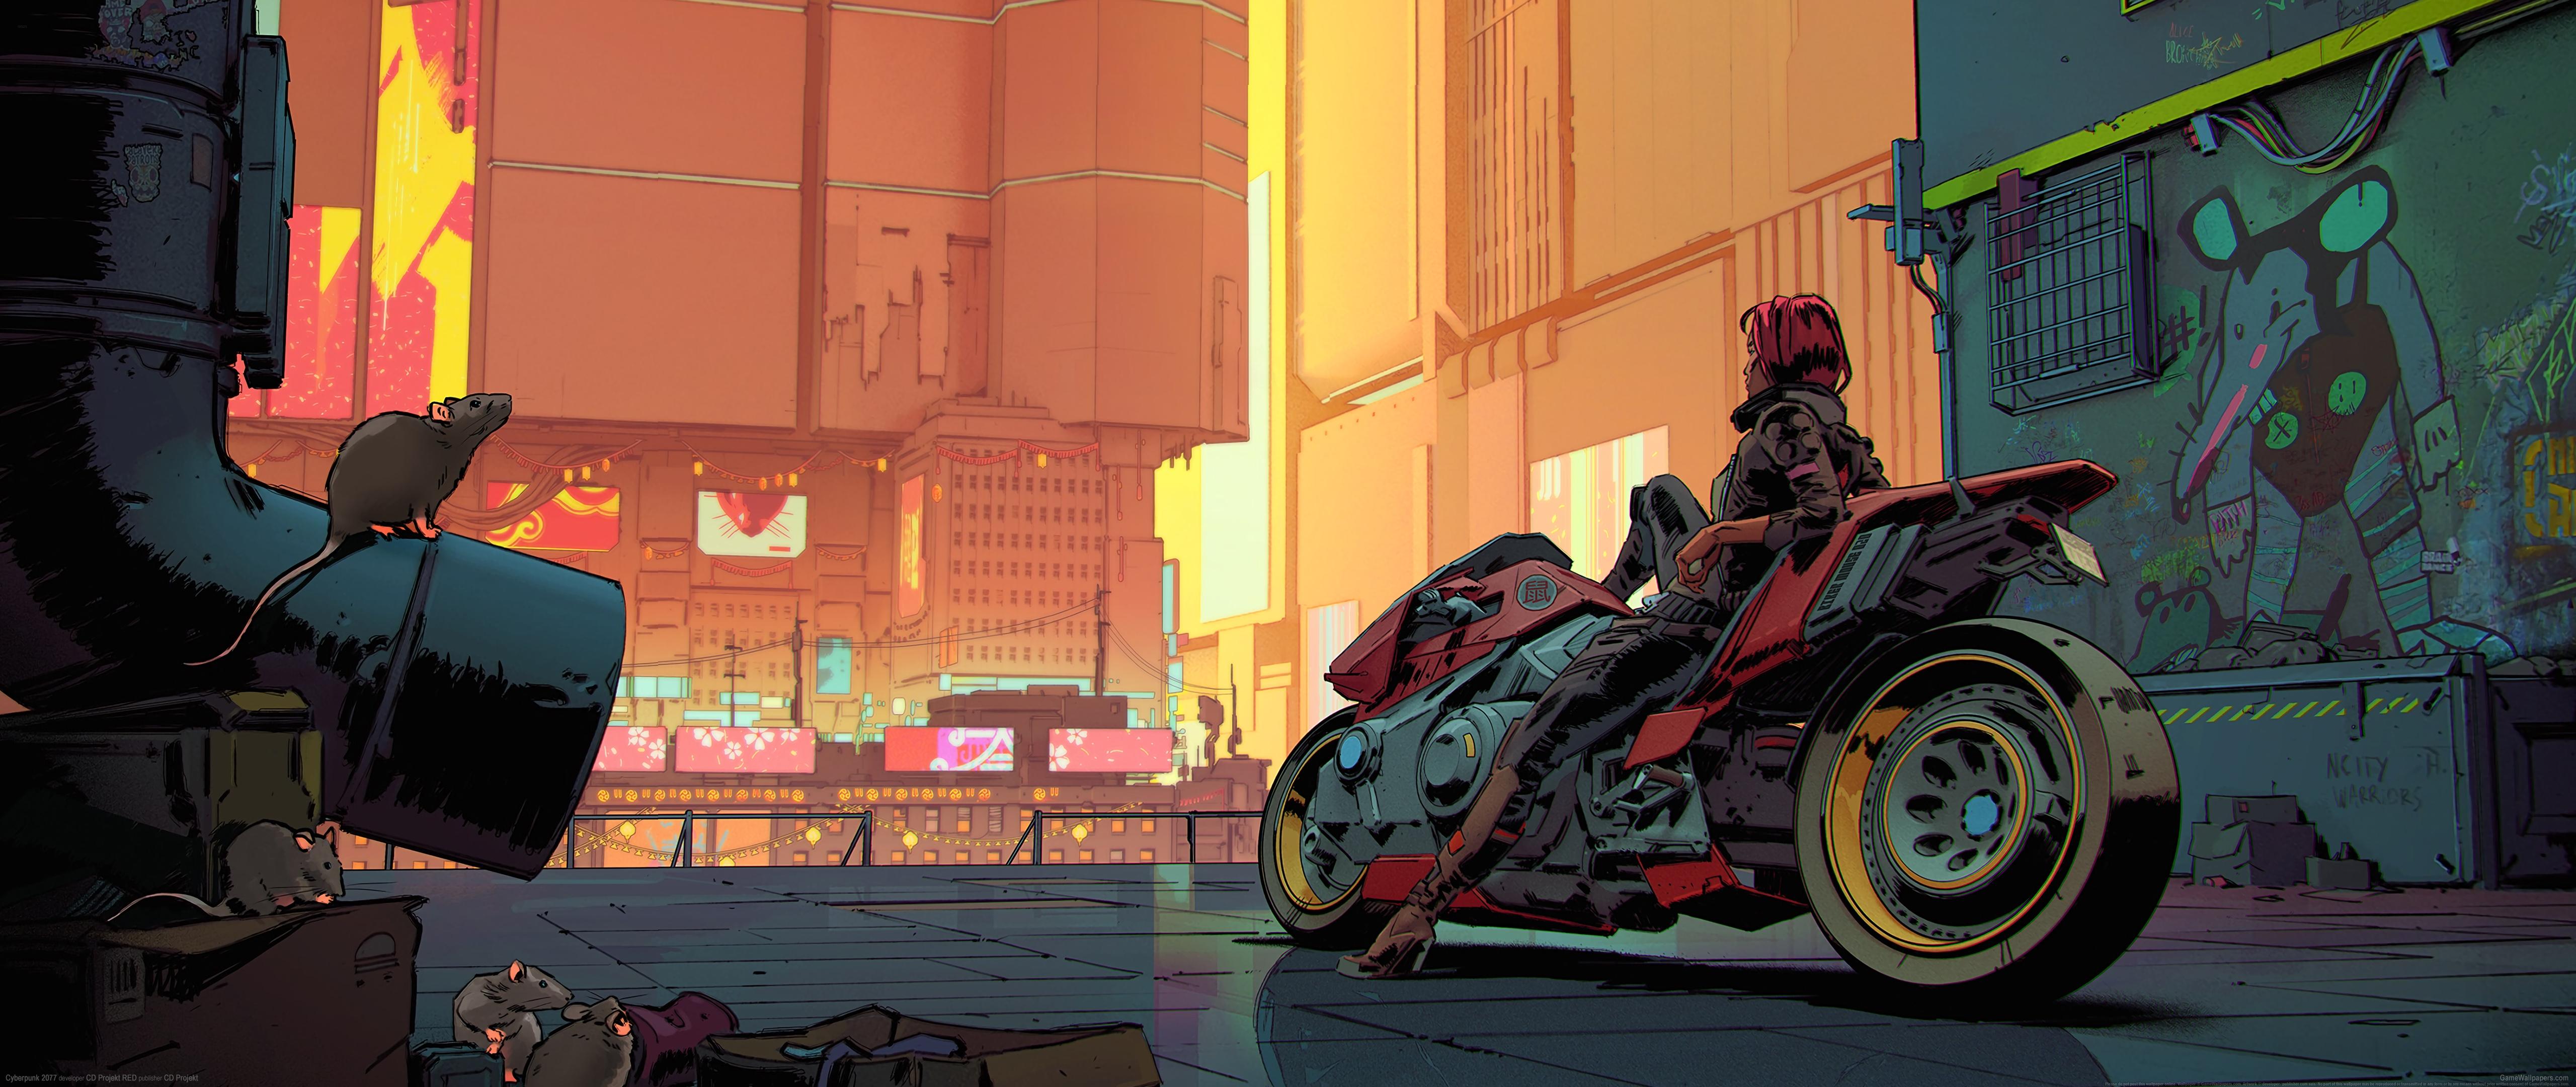 Cyberpunk 2077 5120x2160 fond d'écran 27